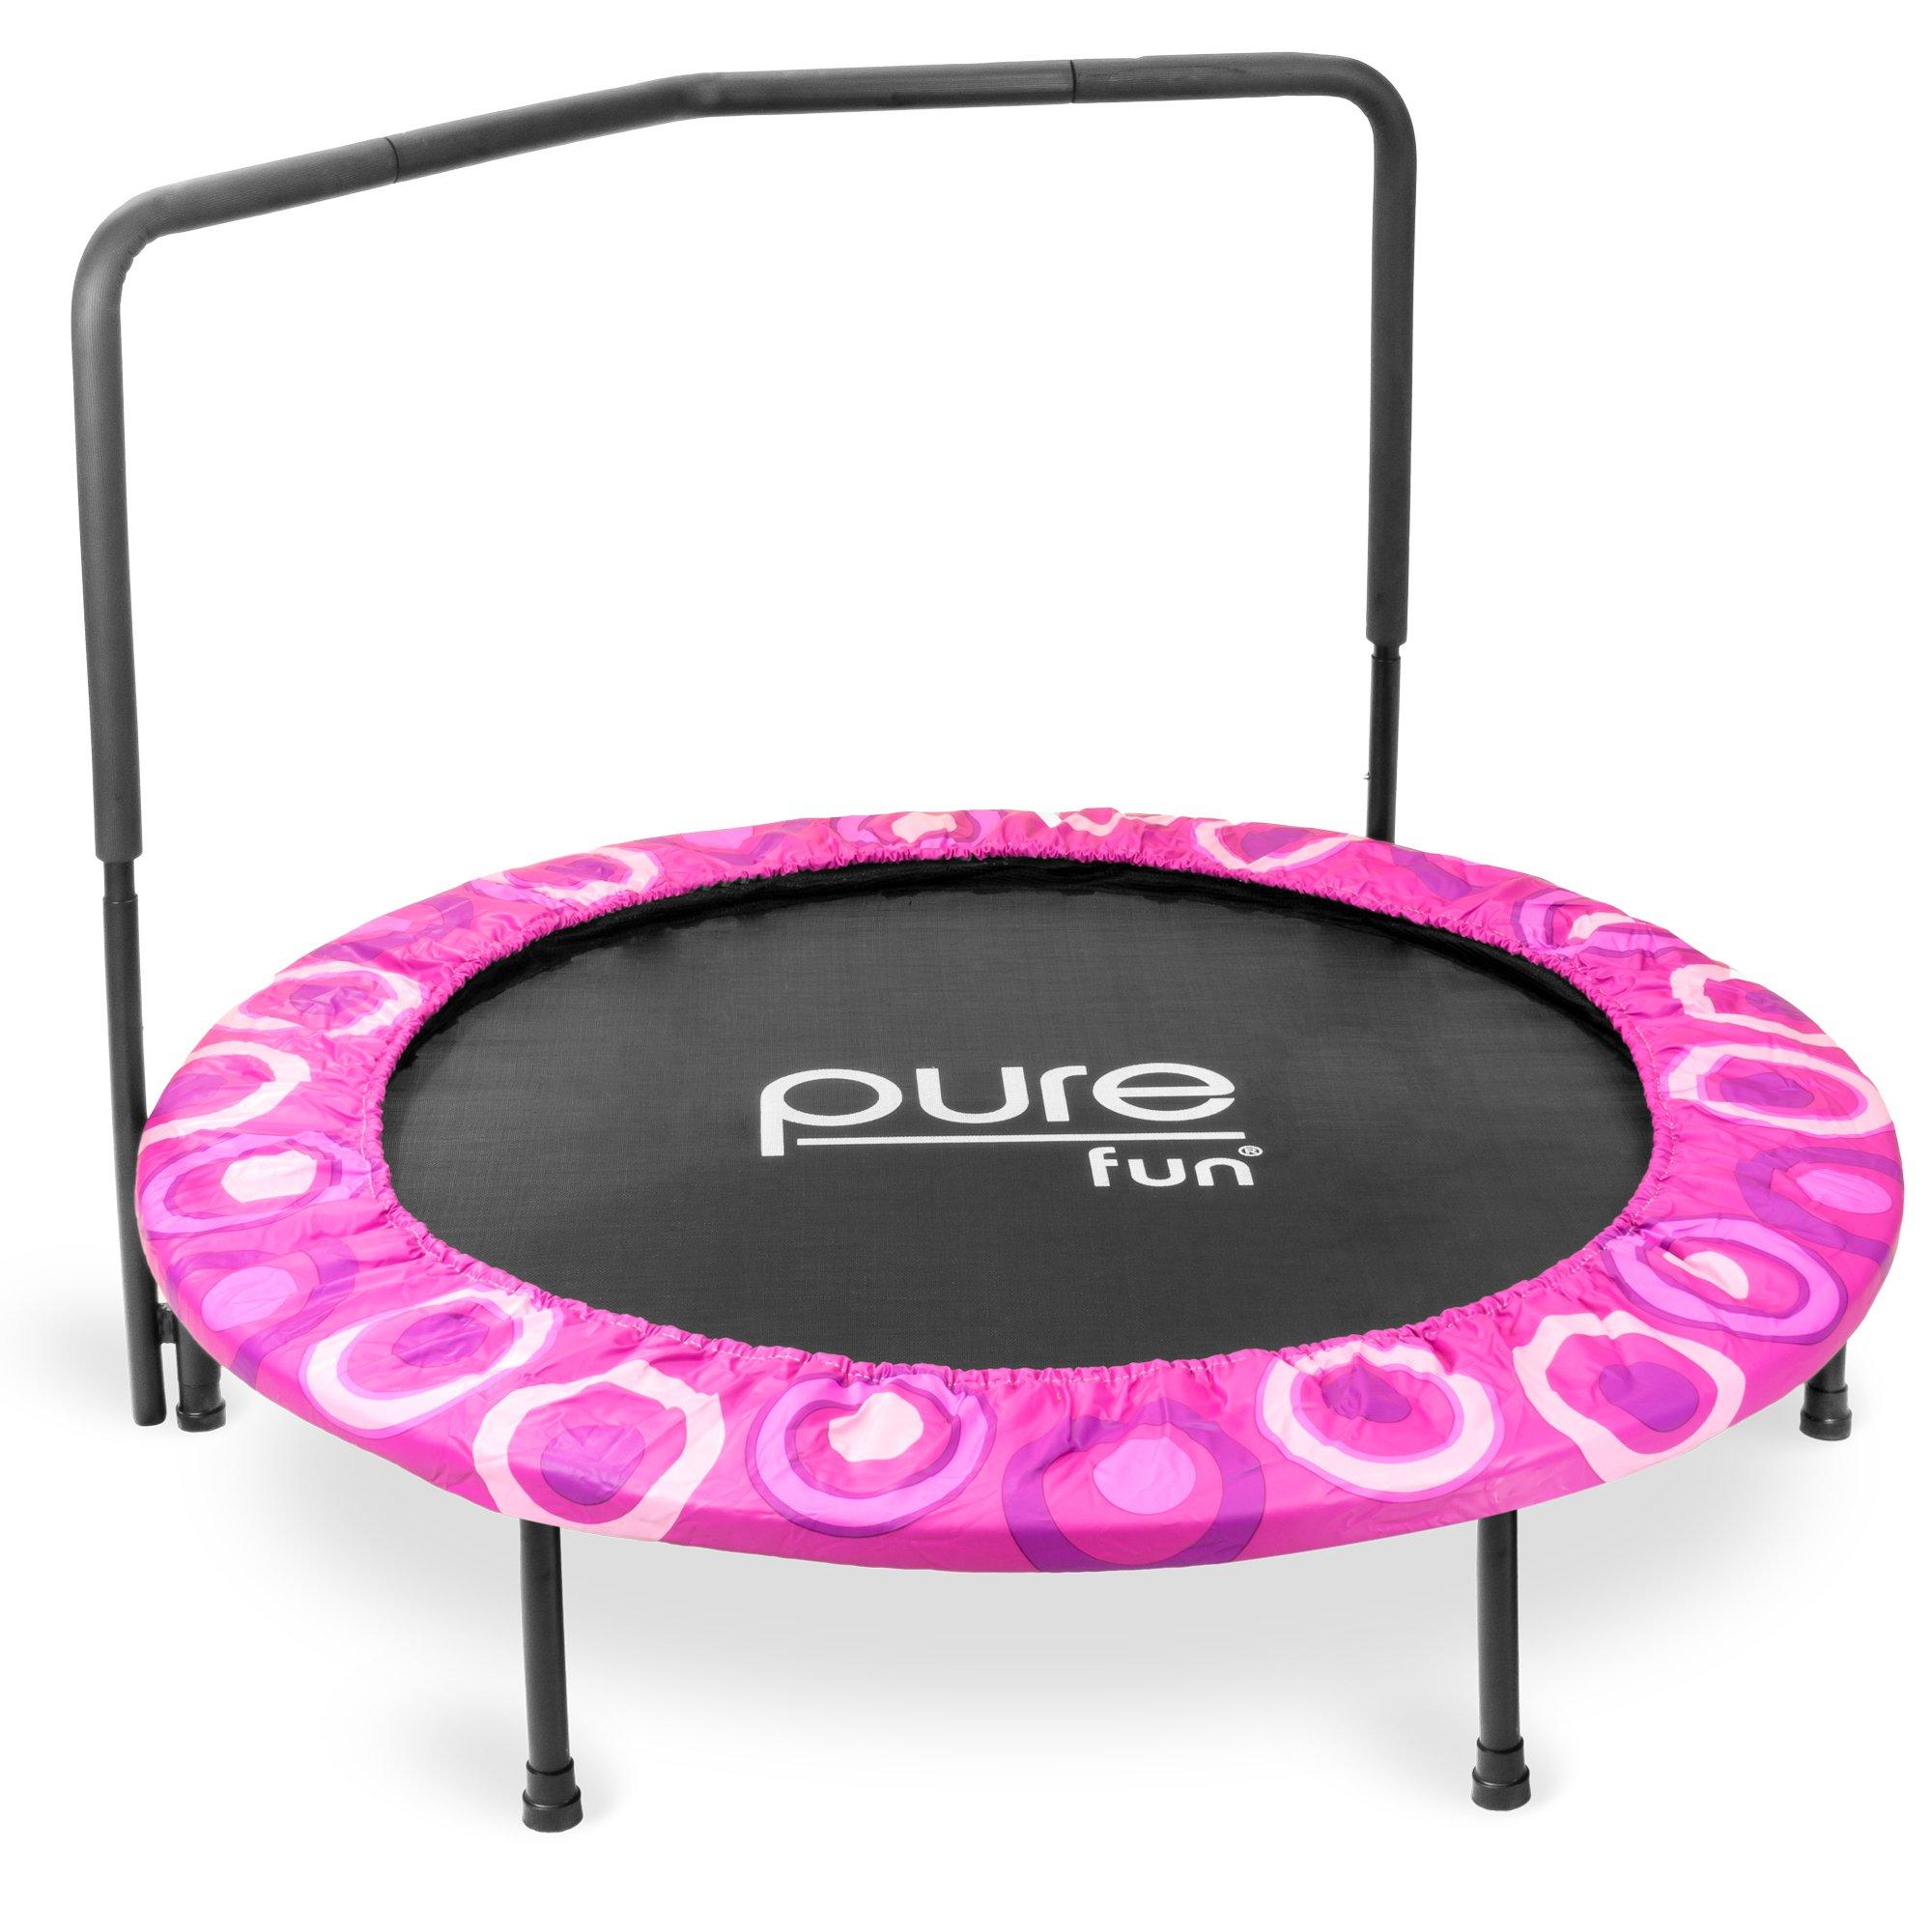 Pure Fun 9008SJ Super Jumper Kids Trampoline with Handrail, Pink - 48 Inches